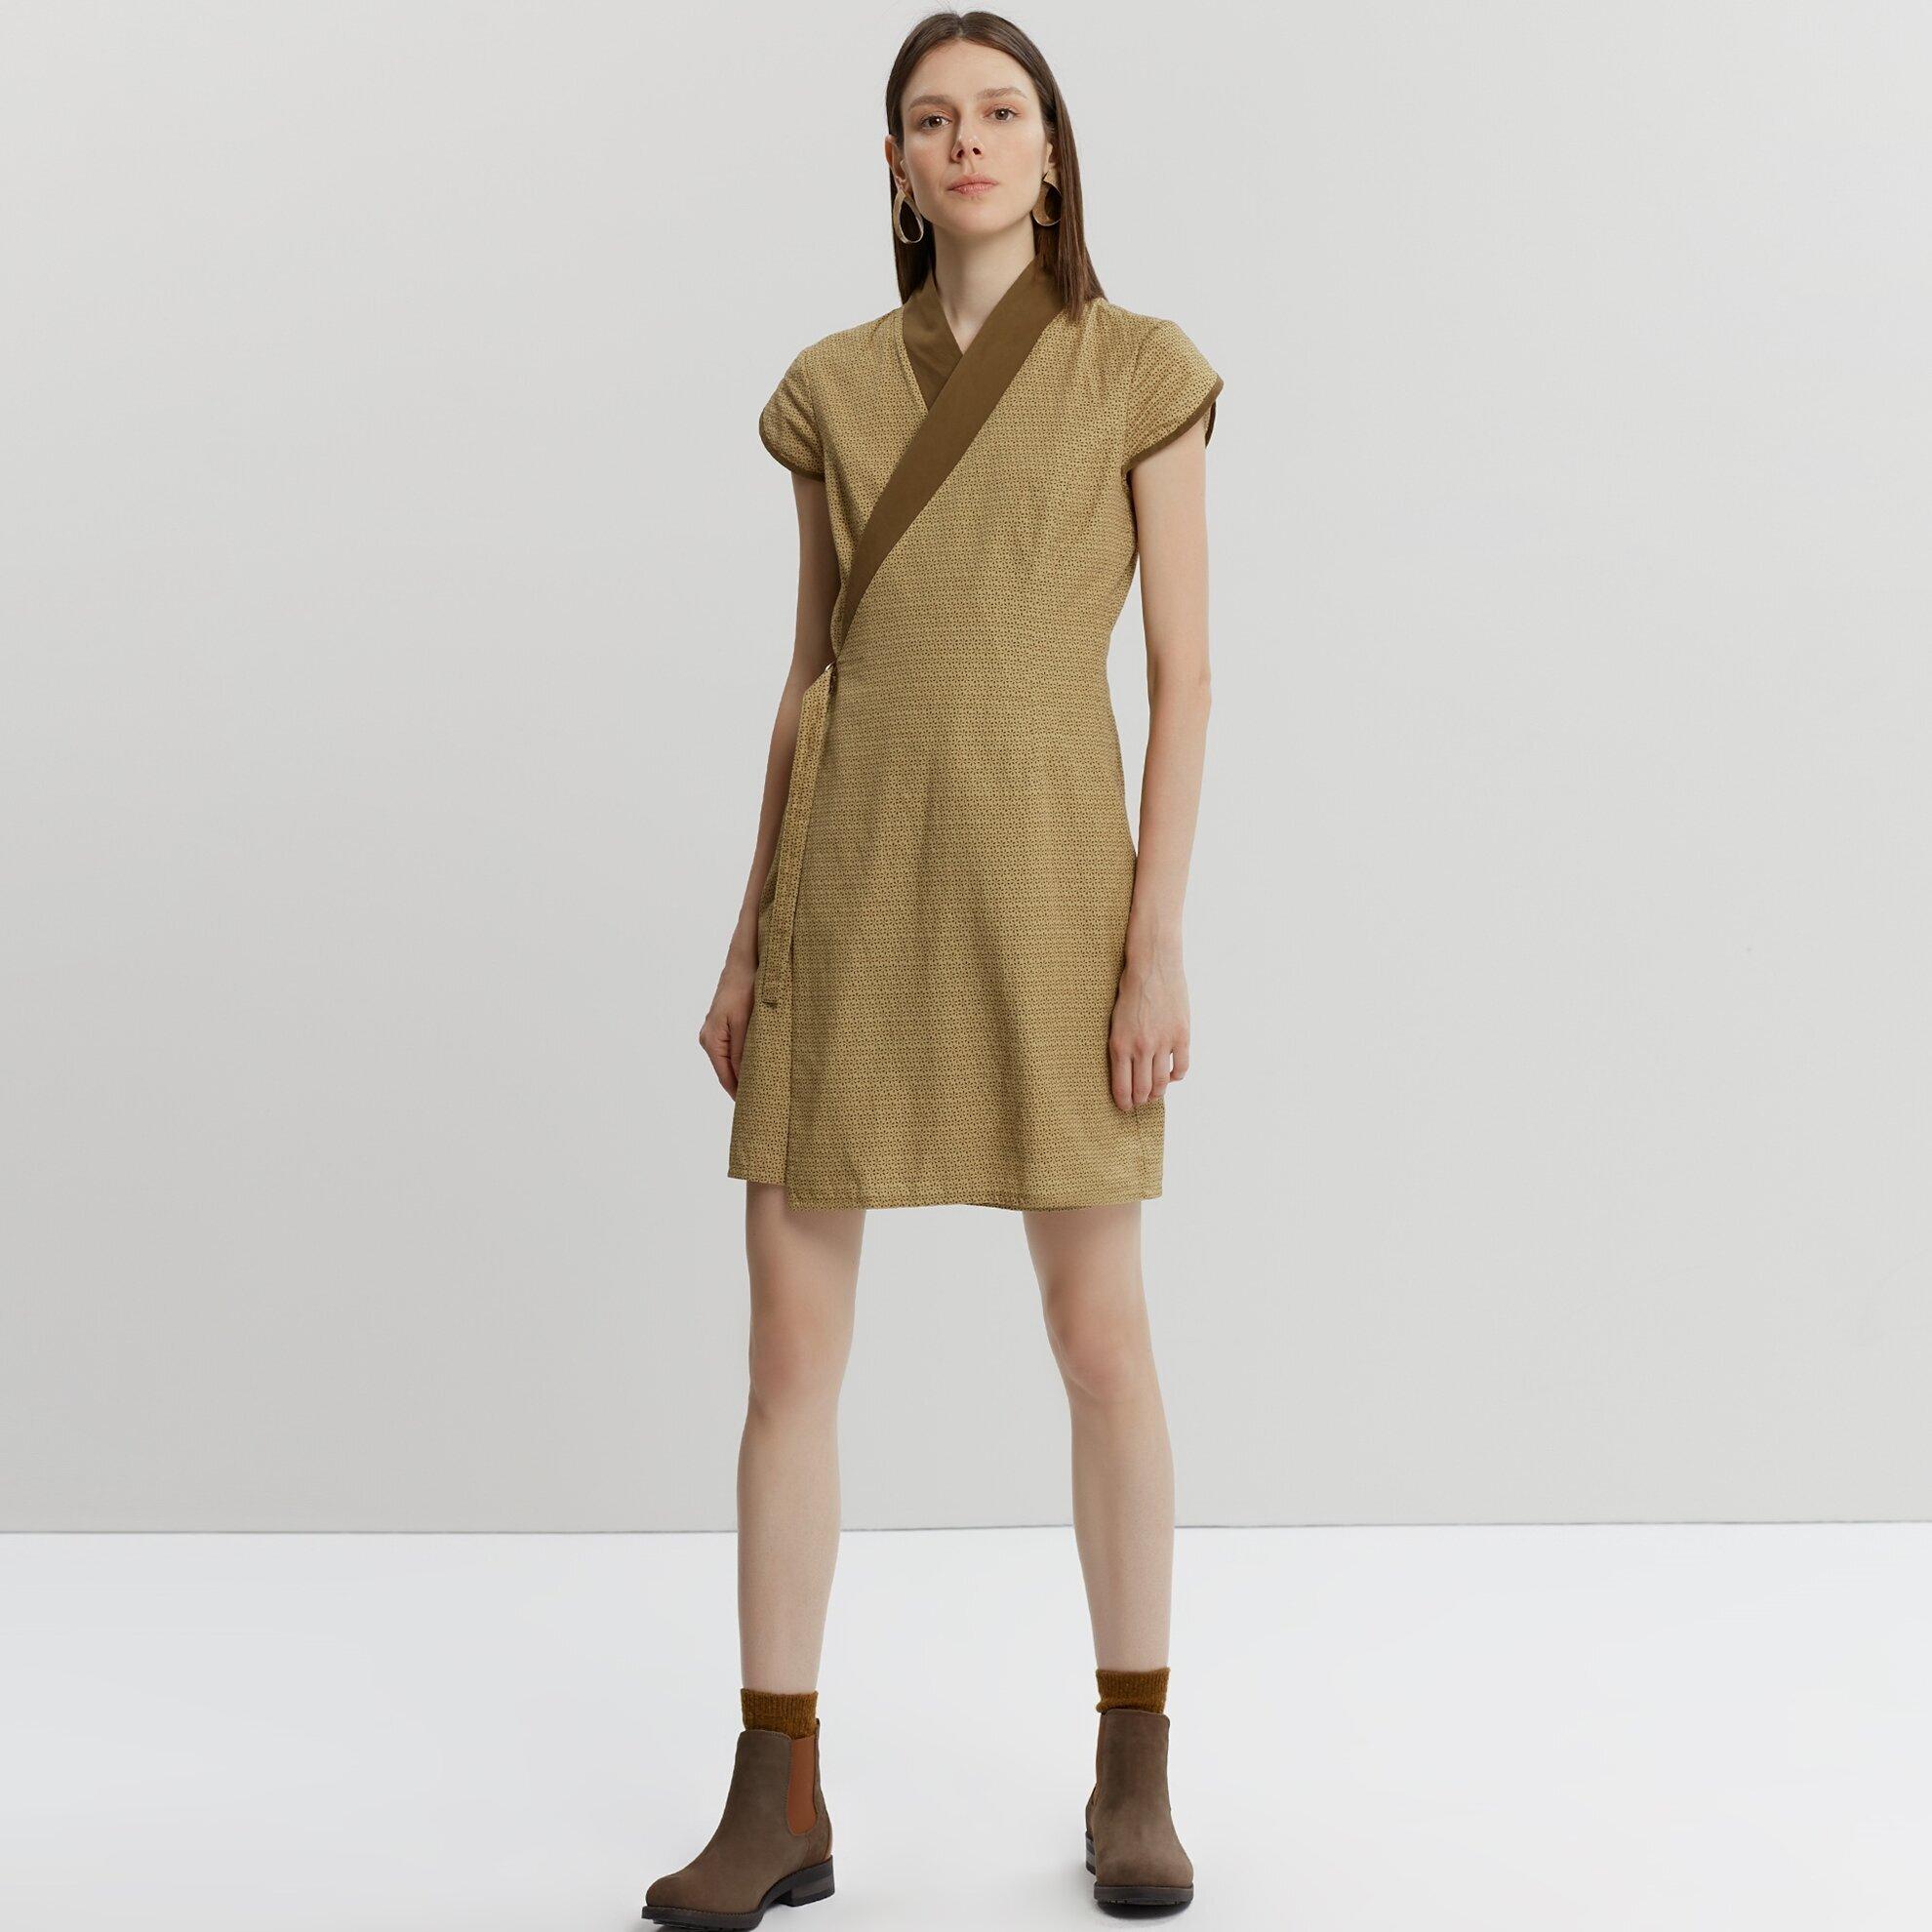 Sleeve Detail Dress